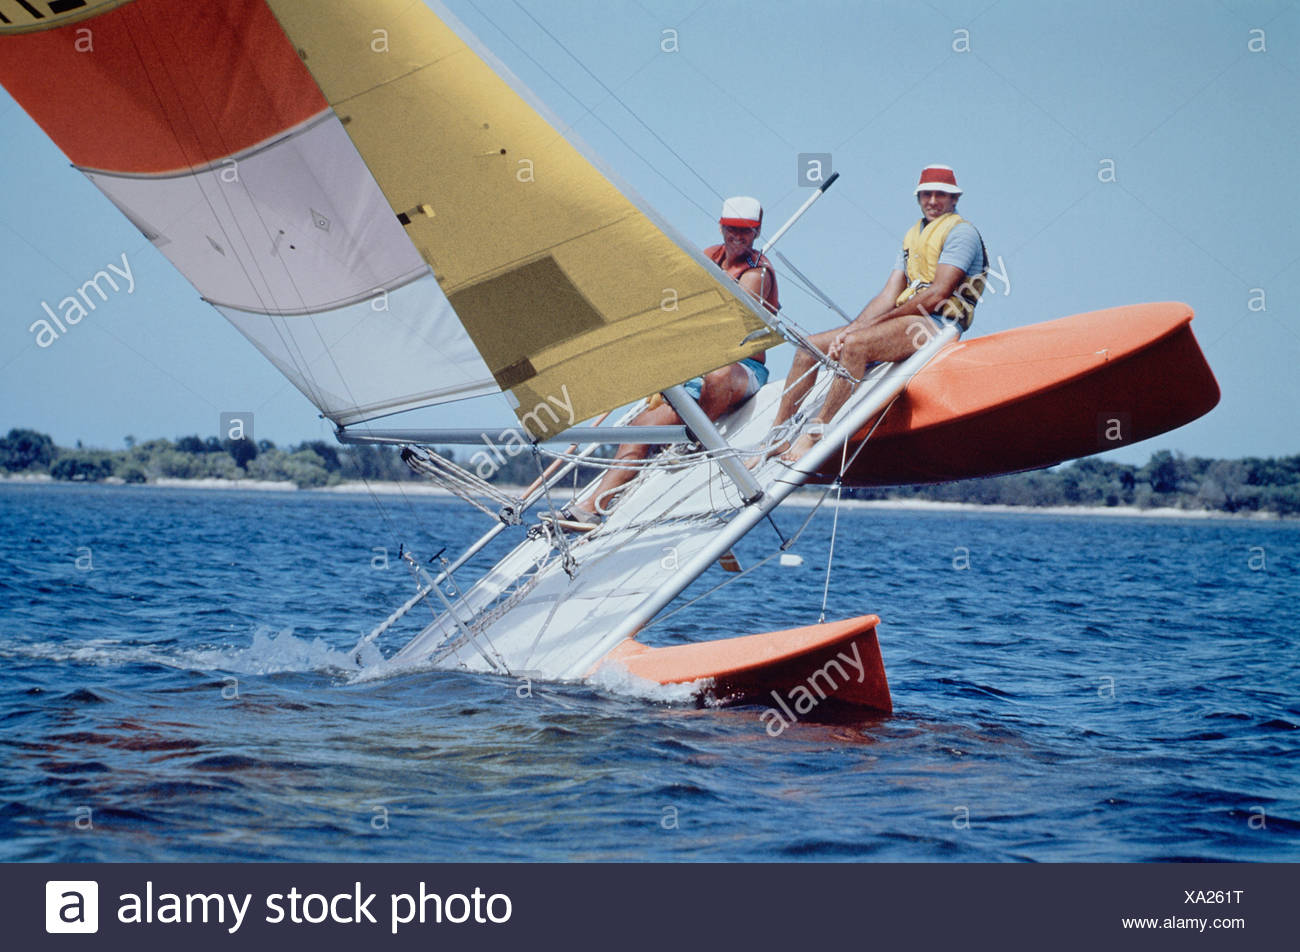 Australia. Two men sailing catamaran yacht tipping on one hull. Stock Photo